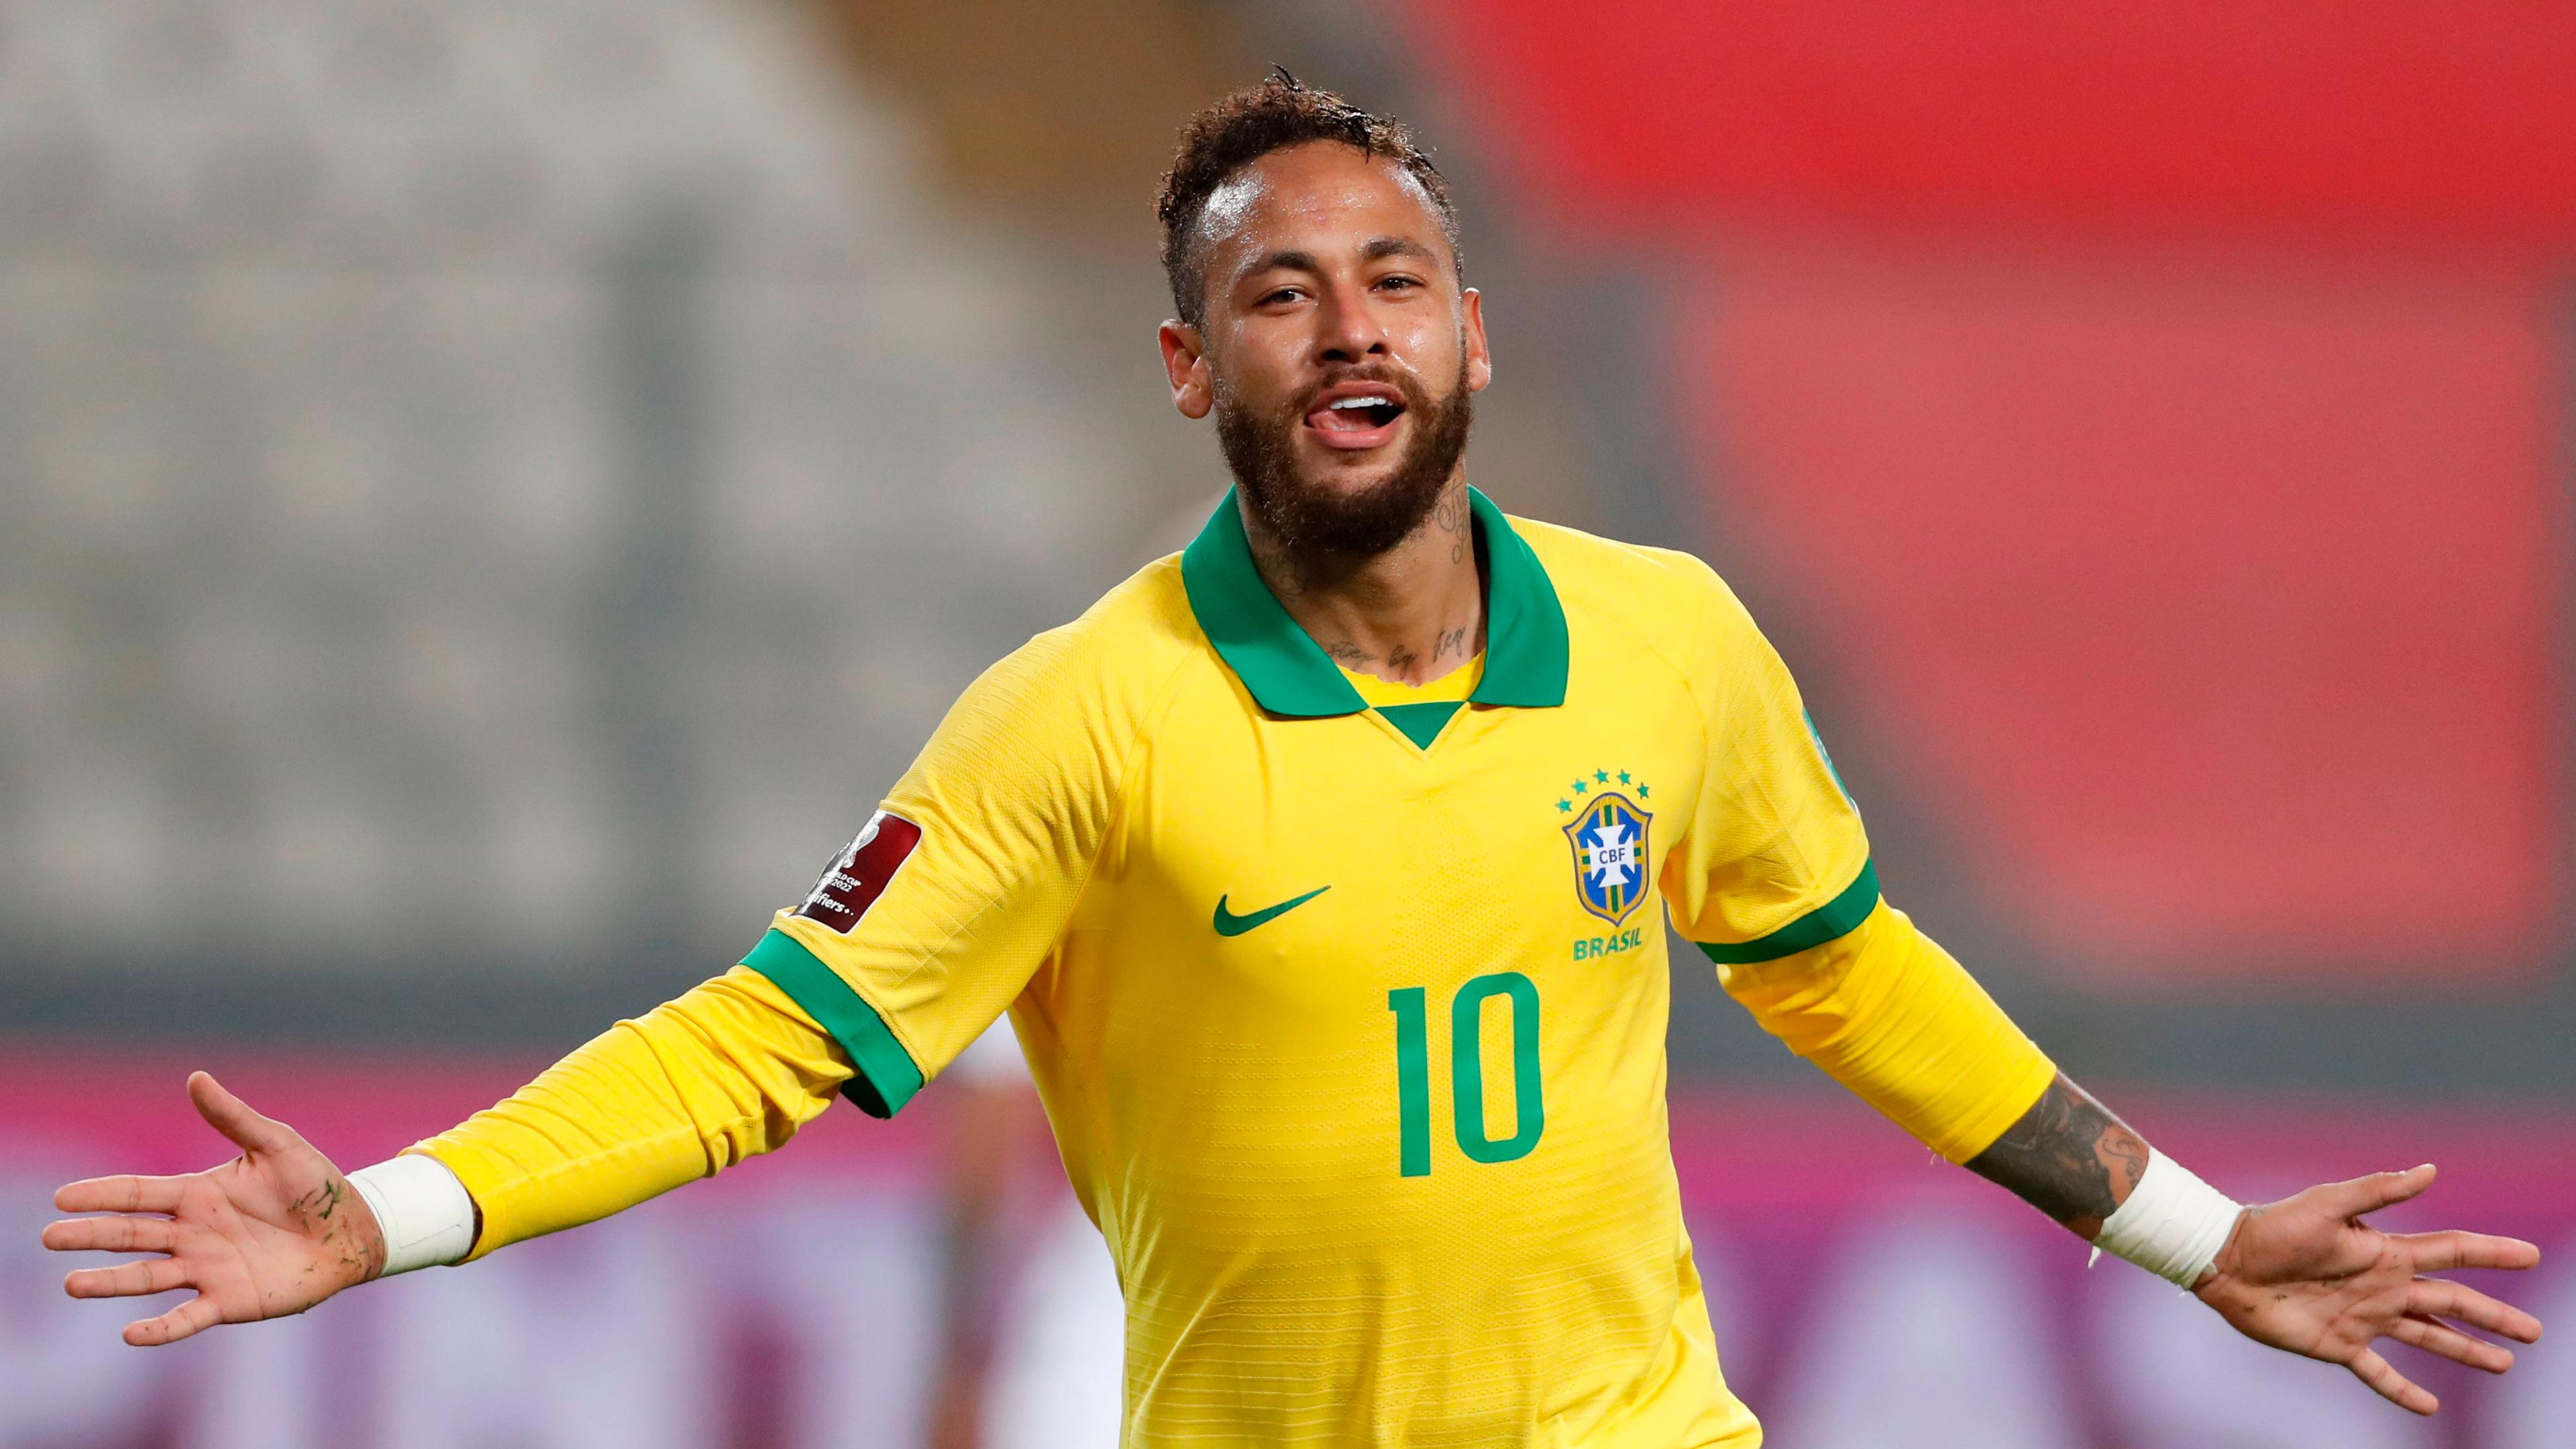 'Neymar is a real clown!' - Zambrano slams Brazil star for ...